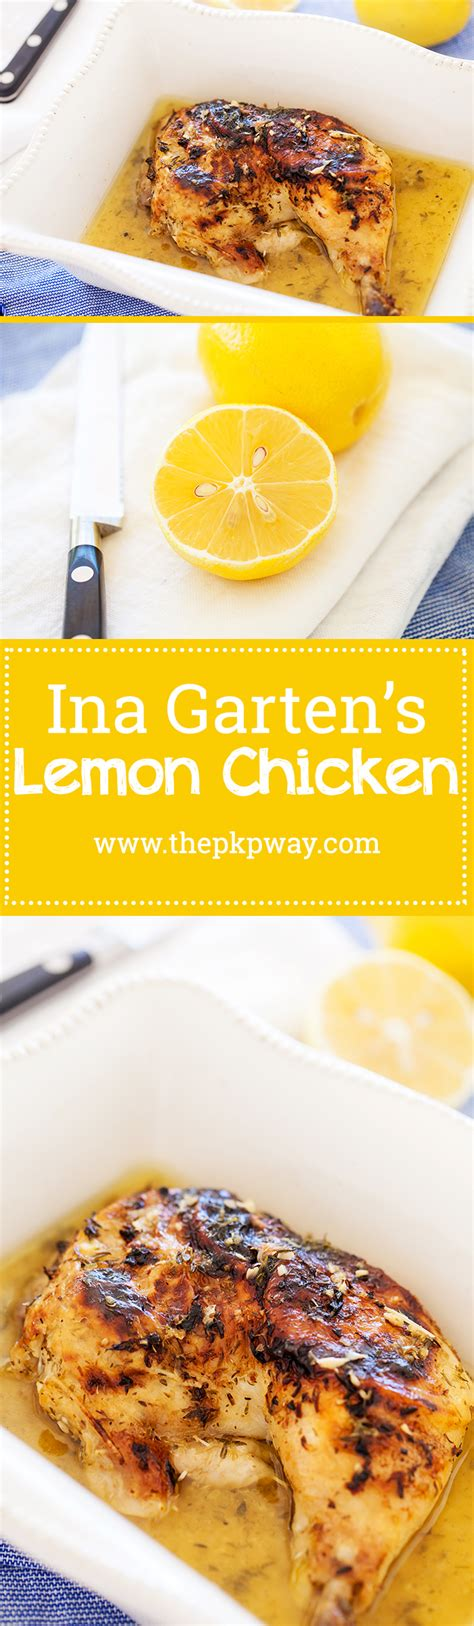 ina garten s lemon chicken the pkp way ina garten s lemon chicken the pkp way